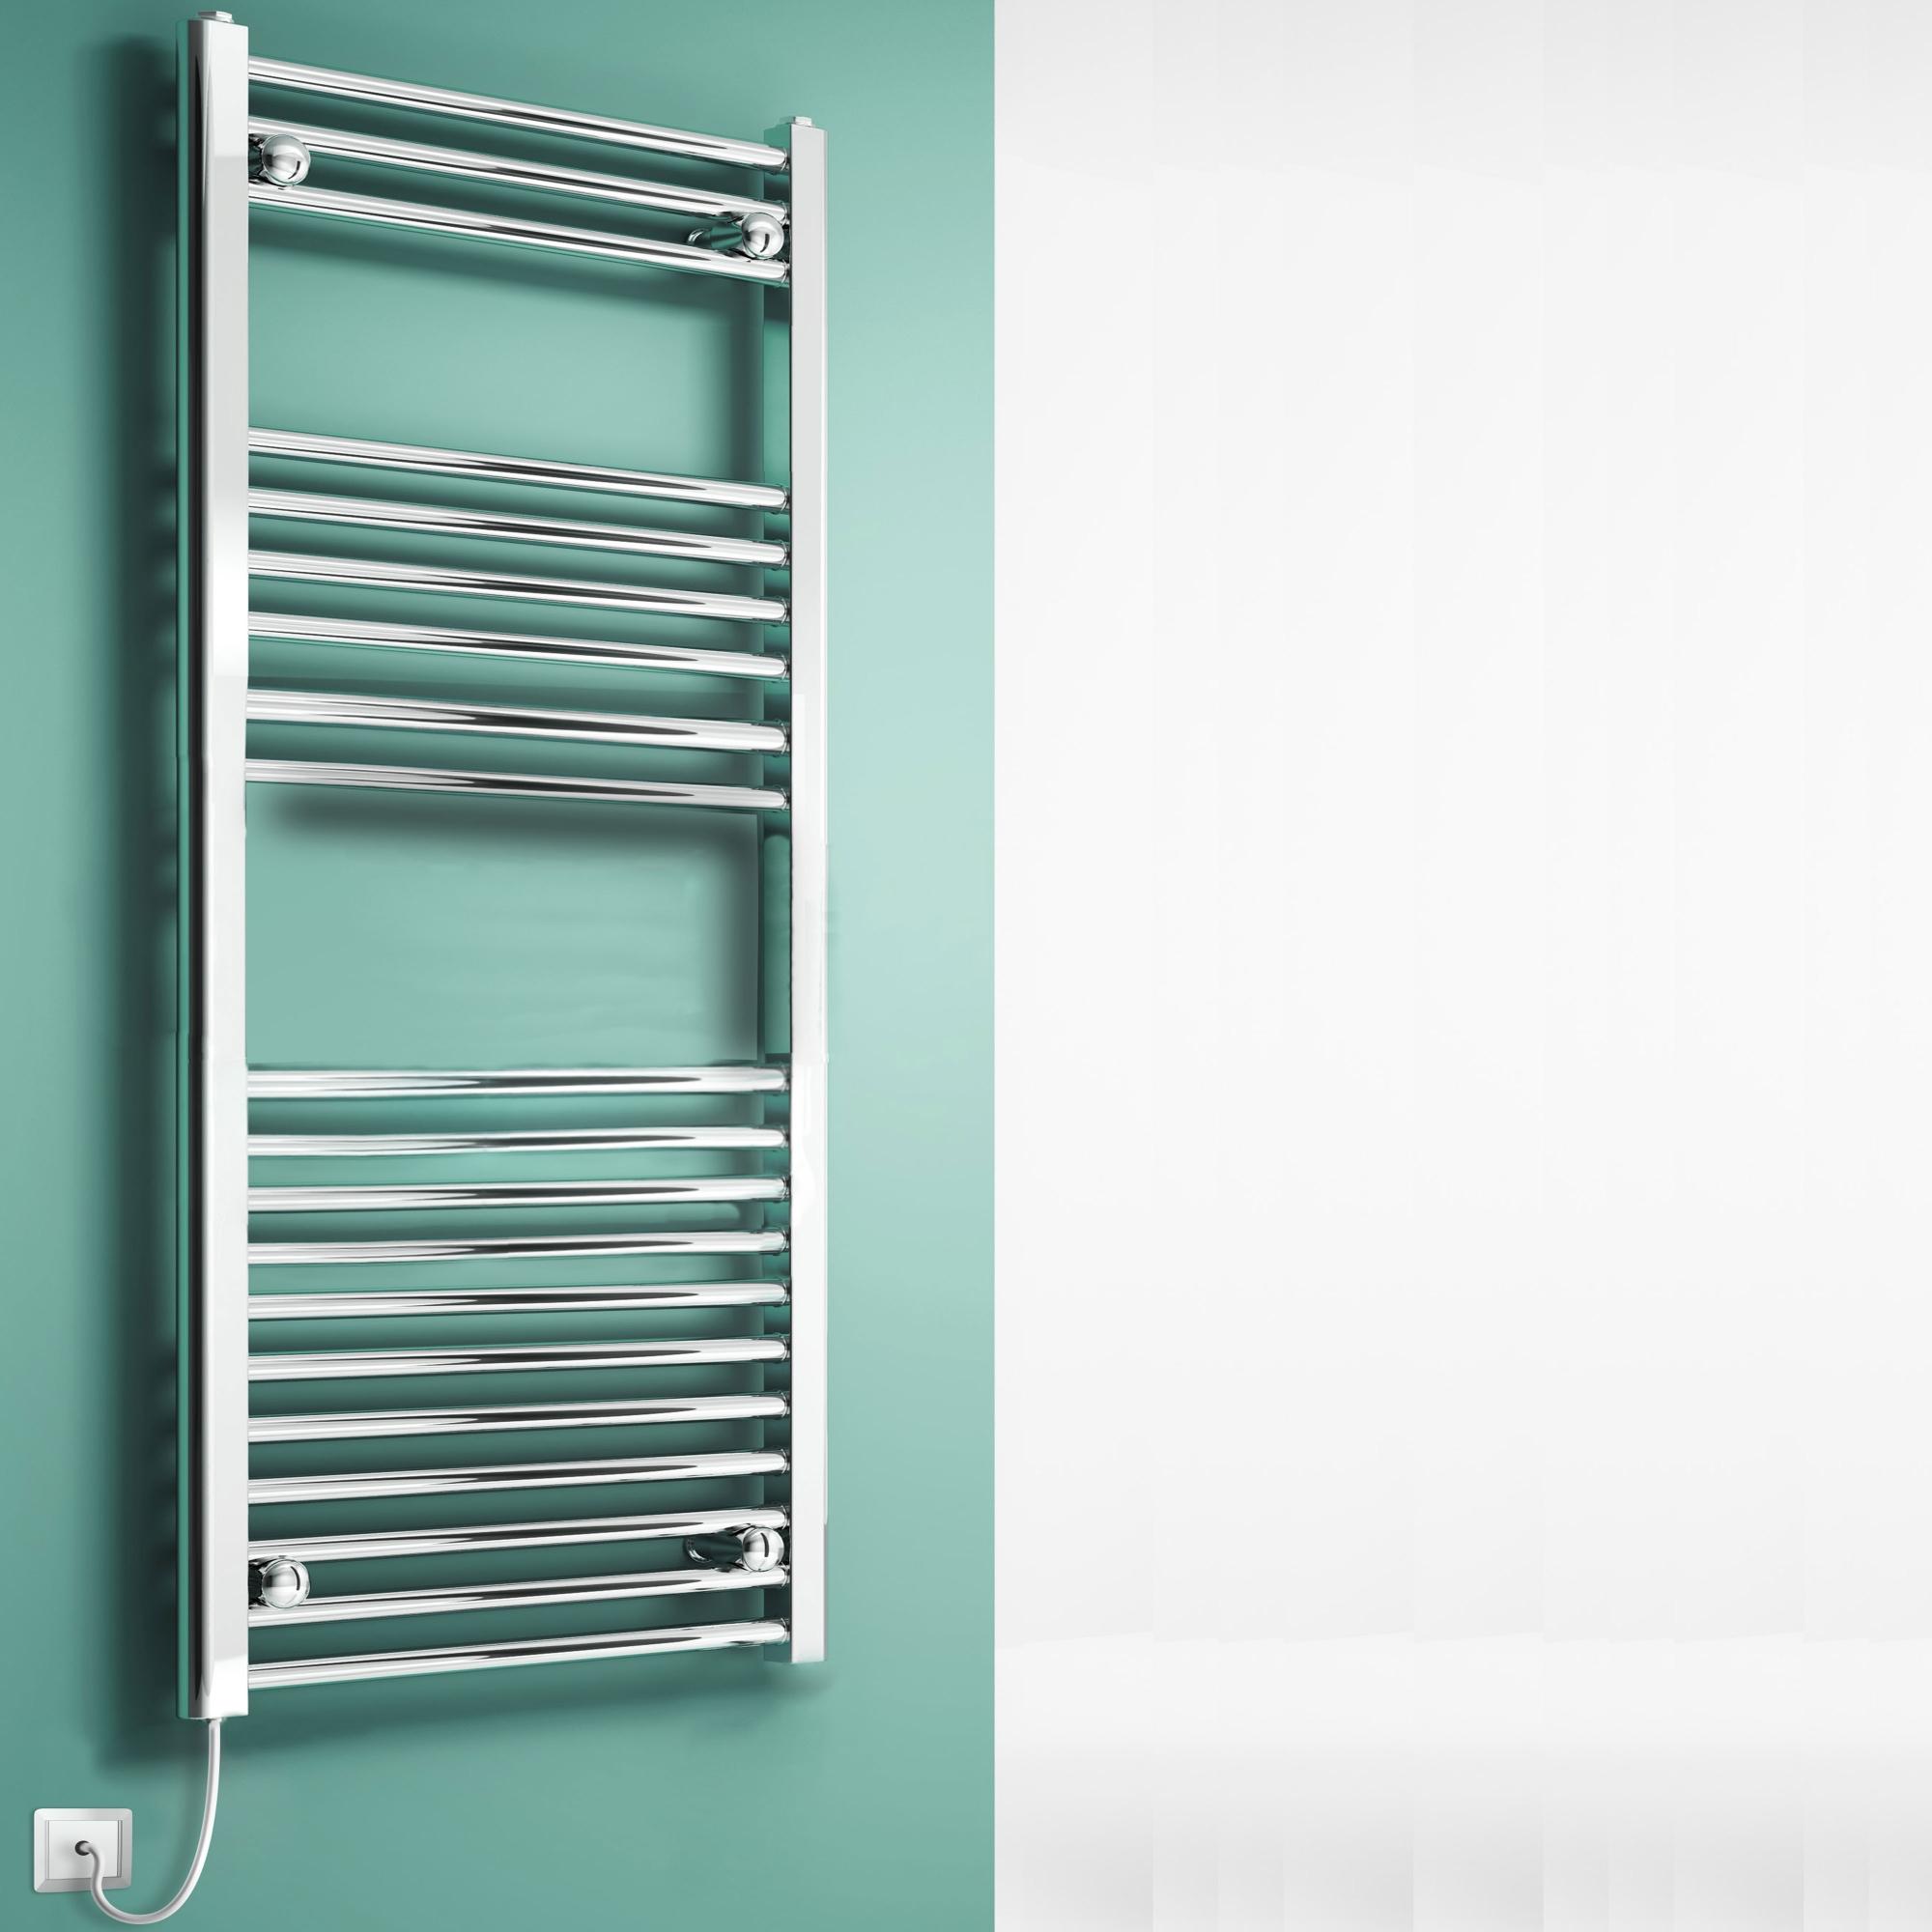 Reina Eross Dry Electric Heated Towel Rail 750mm H x 500mm W-0